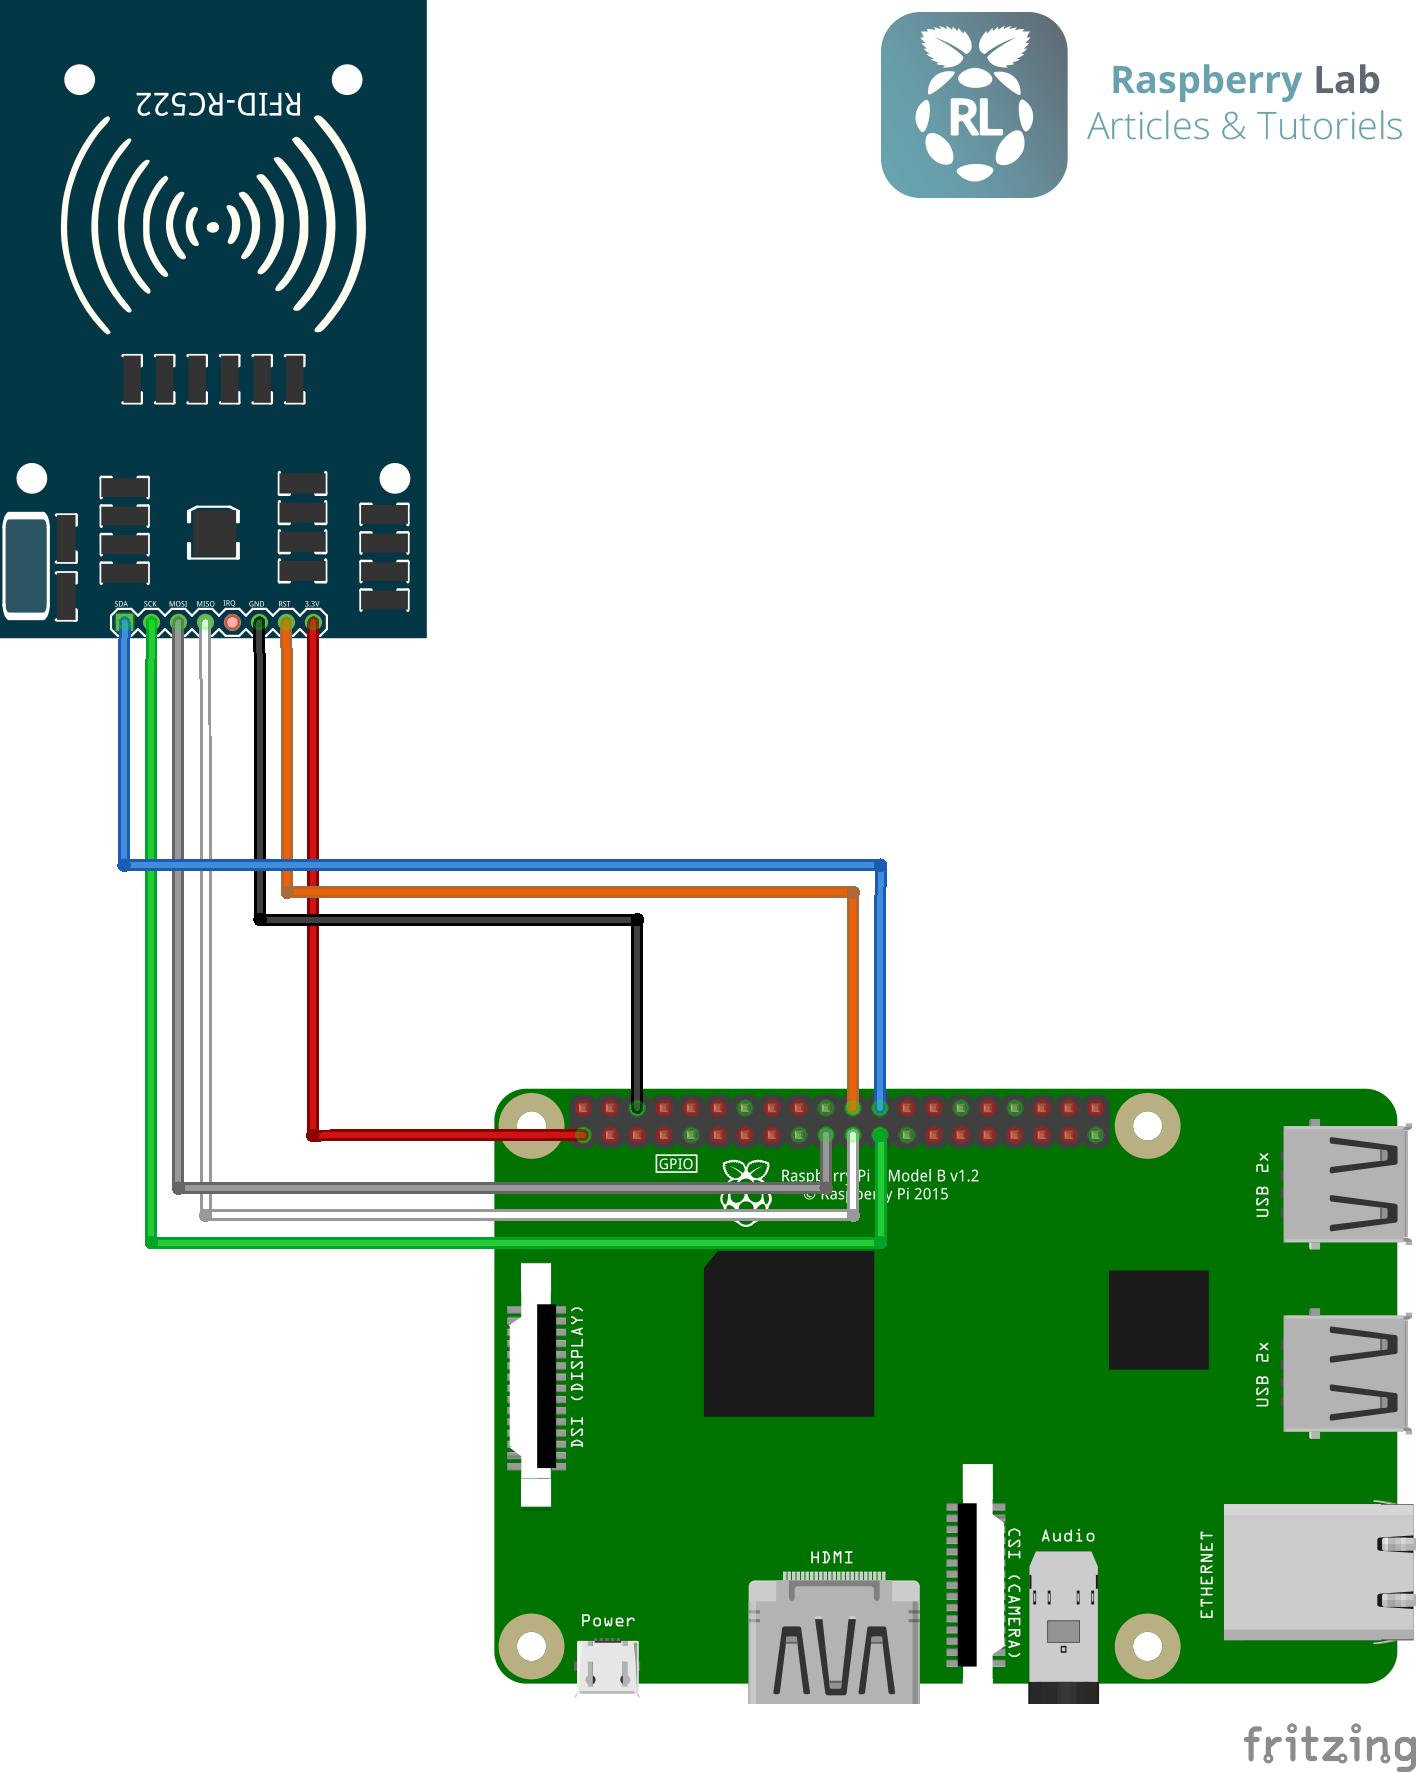 Tuto] Module RFID RC522 sur Raspberry Pi - Espace Raspberry